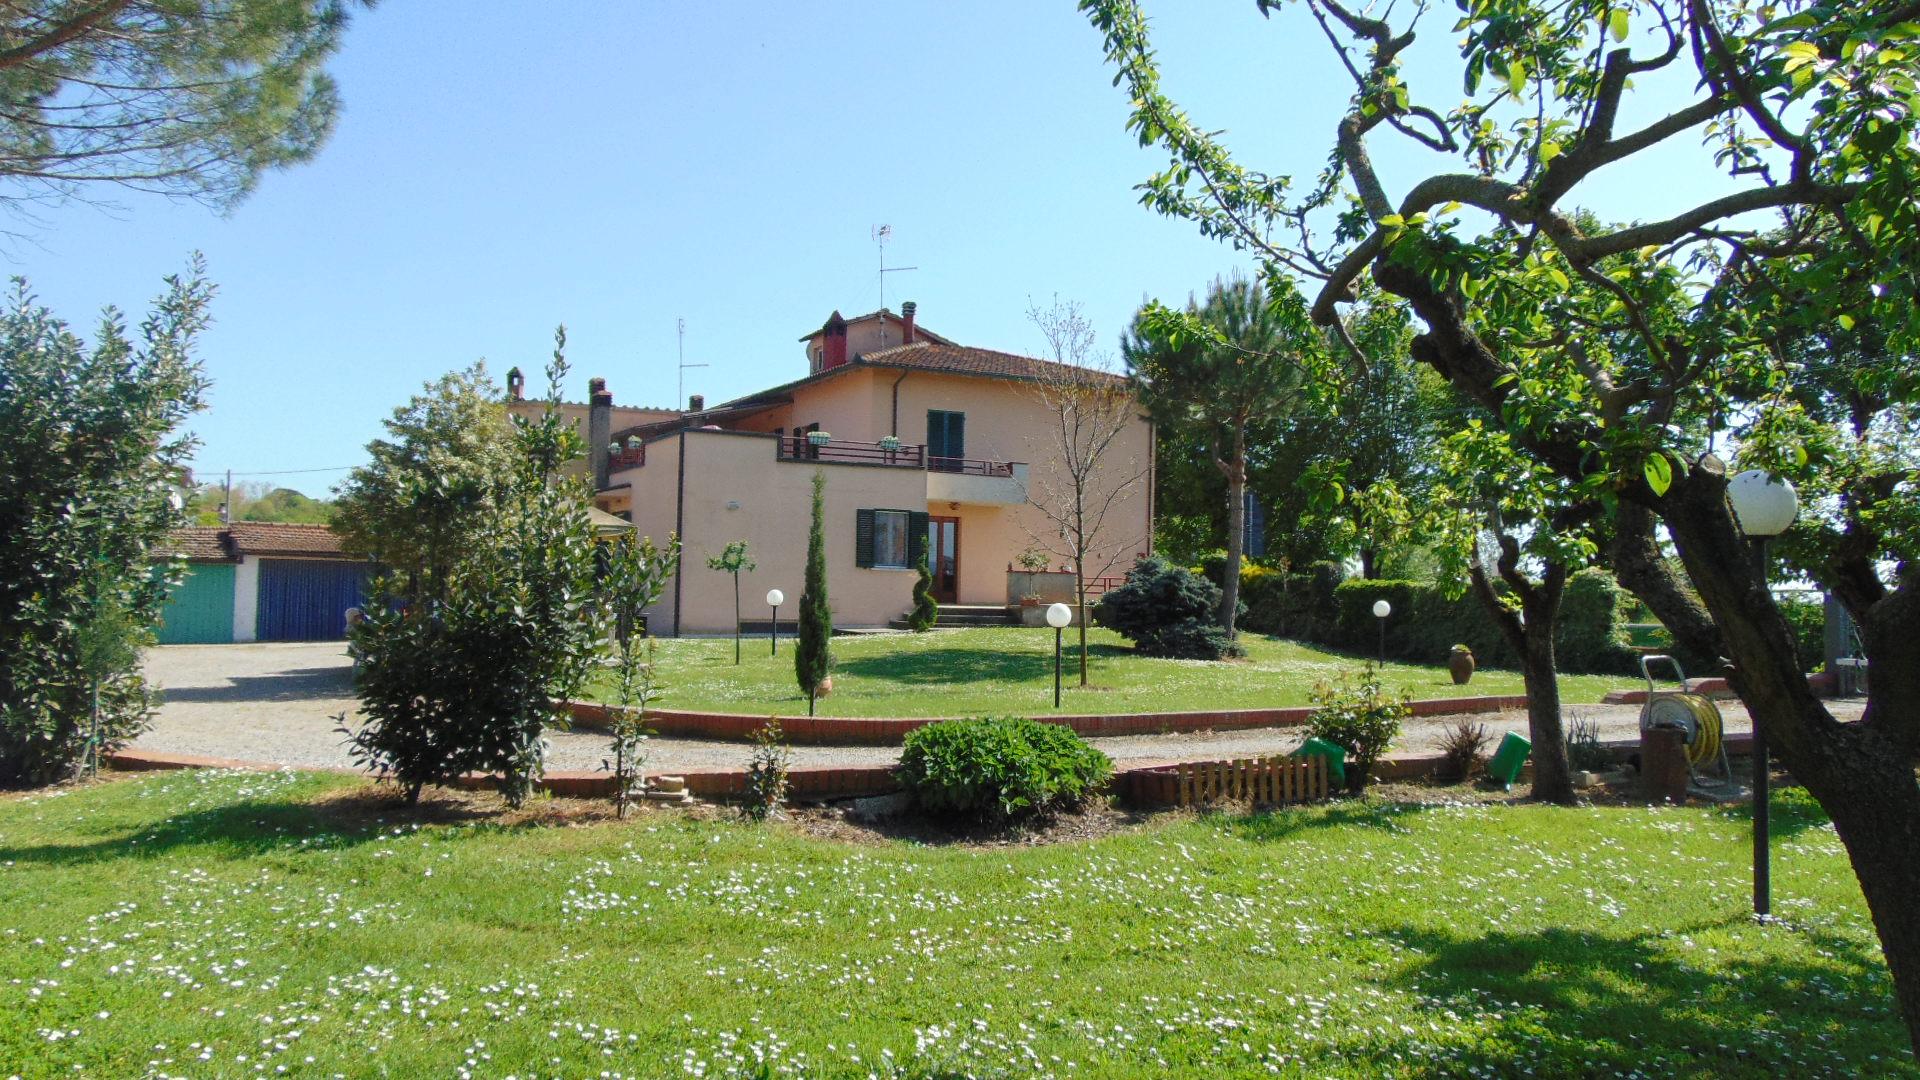 Casa con giardino Arezzo - Planet 1295 - Gruppo Planet ...